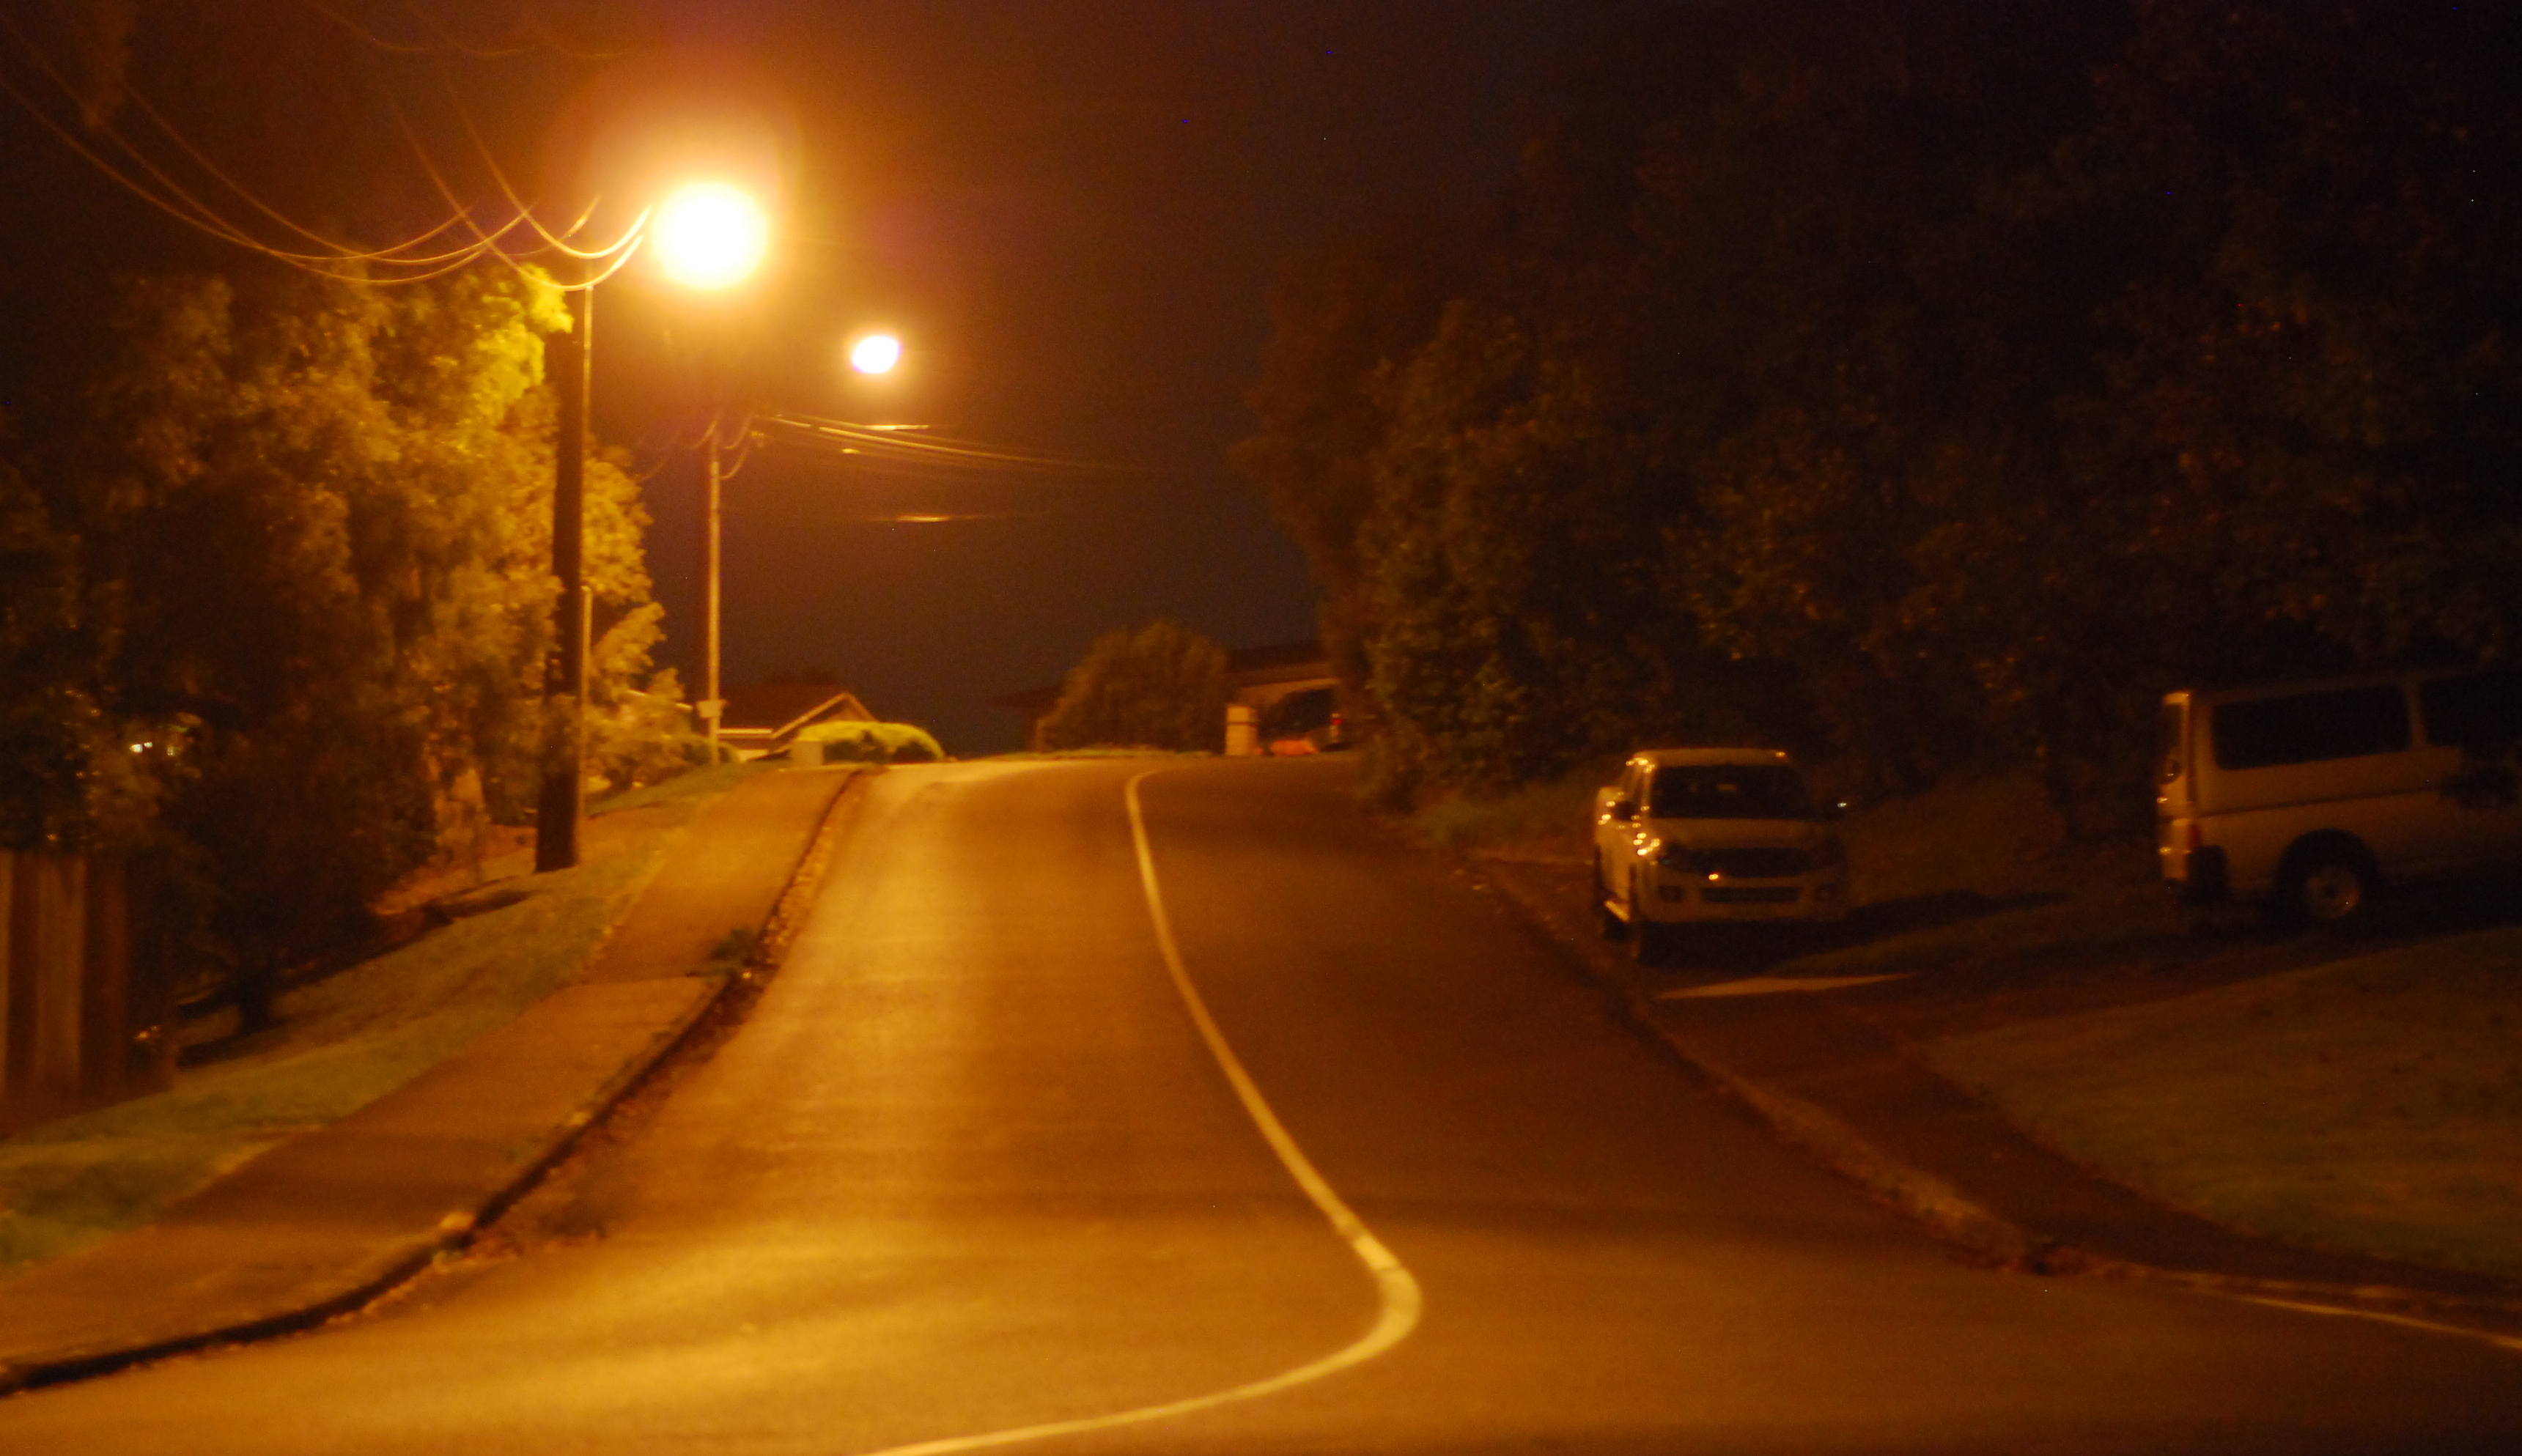 lamp-yellow